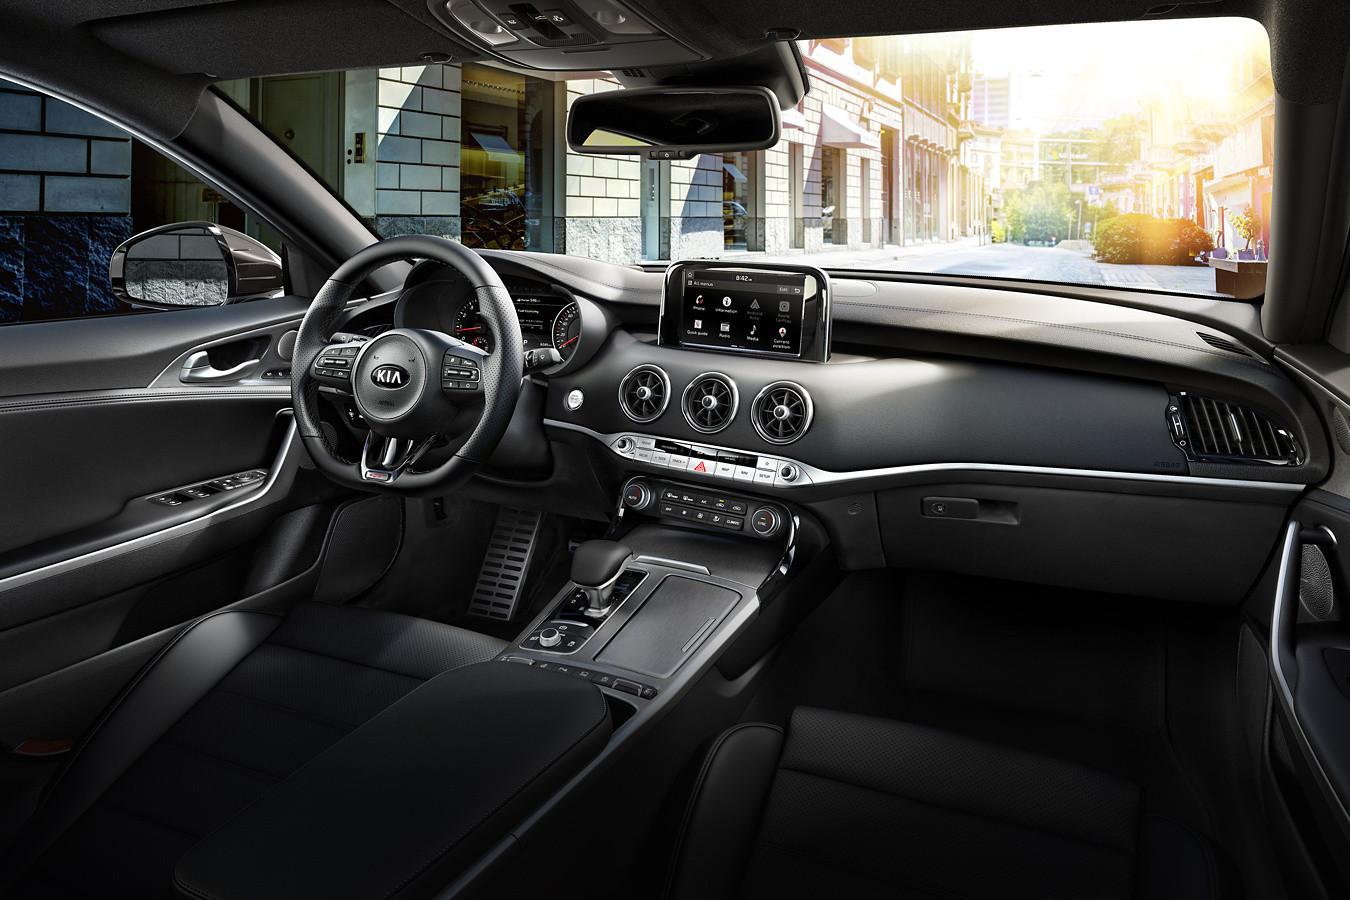 Interior of the 2019 Kia Stinger